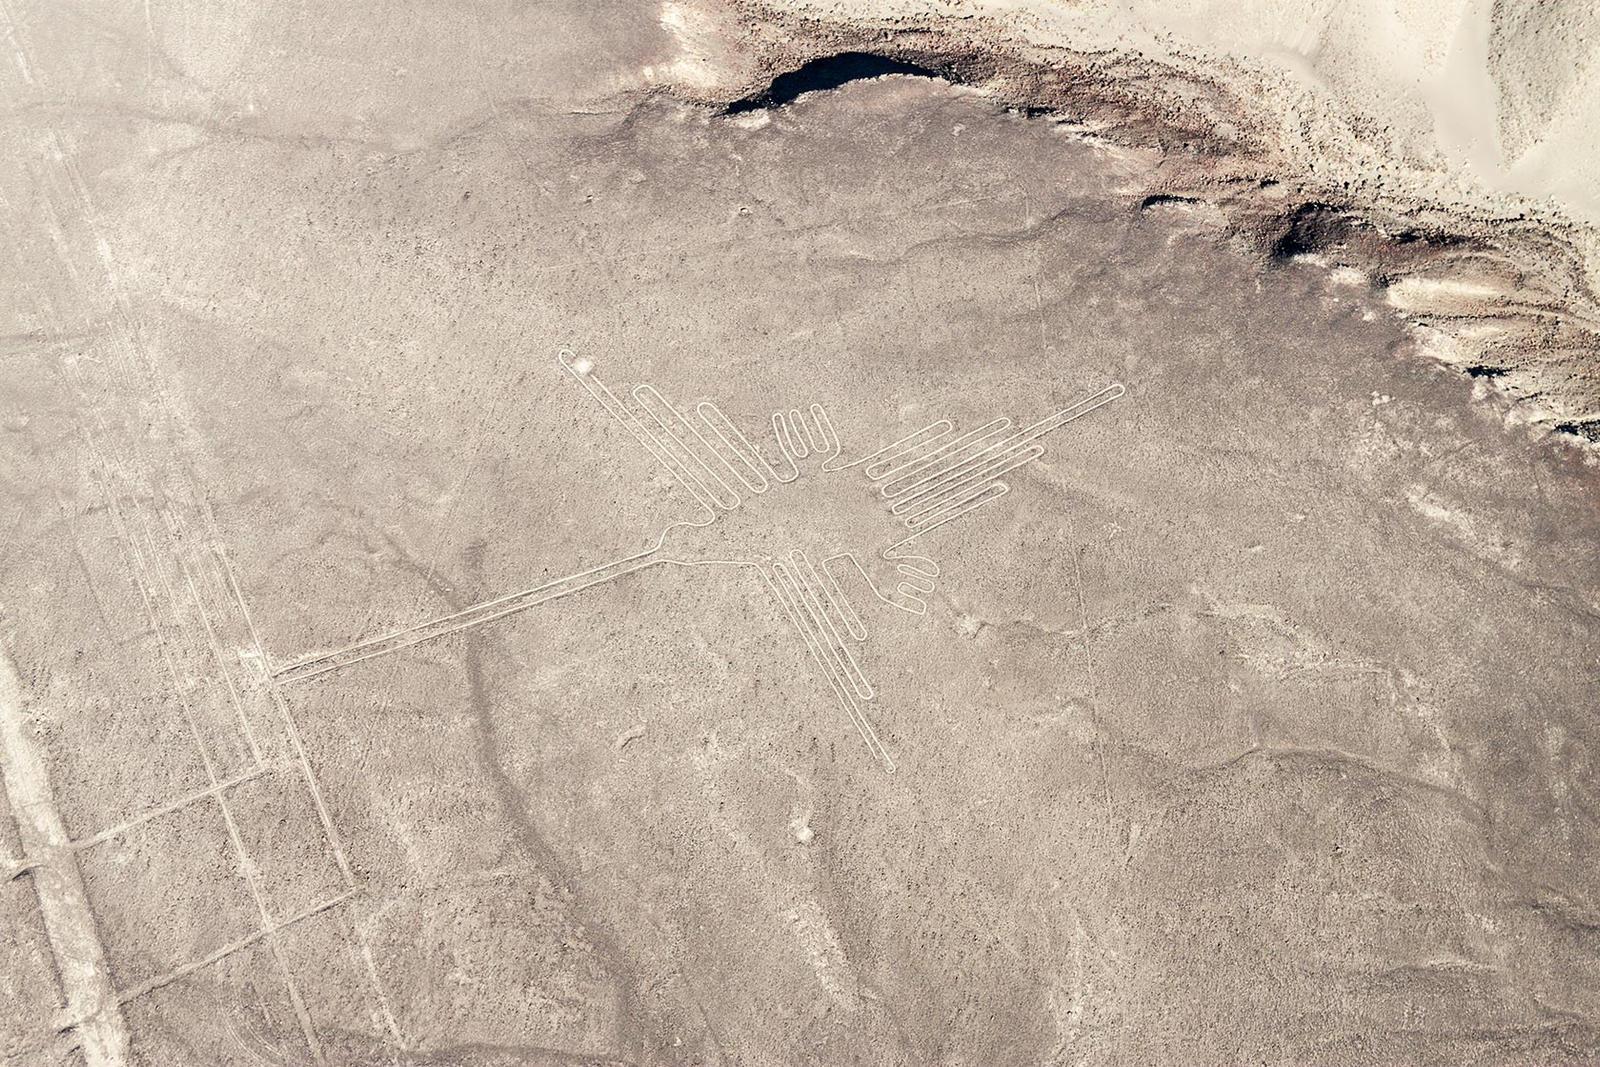 Nazca - The Hummingbird by TarJakArt